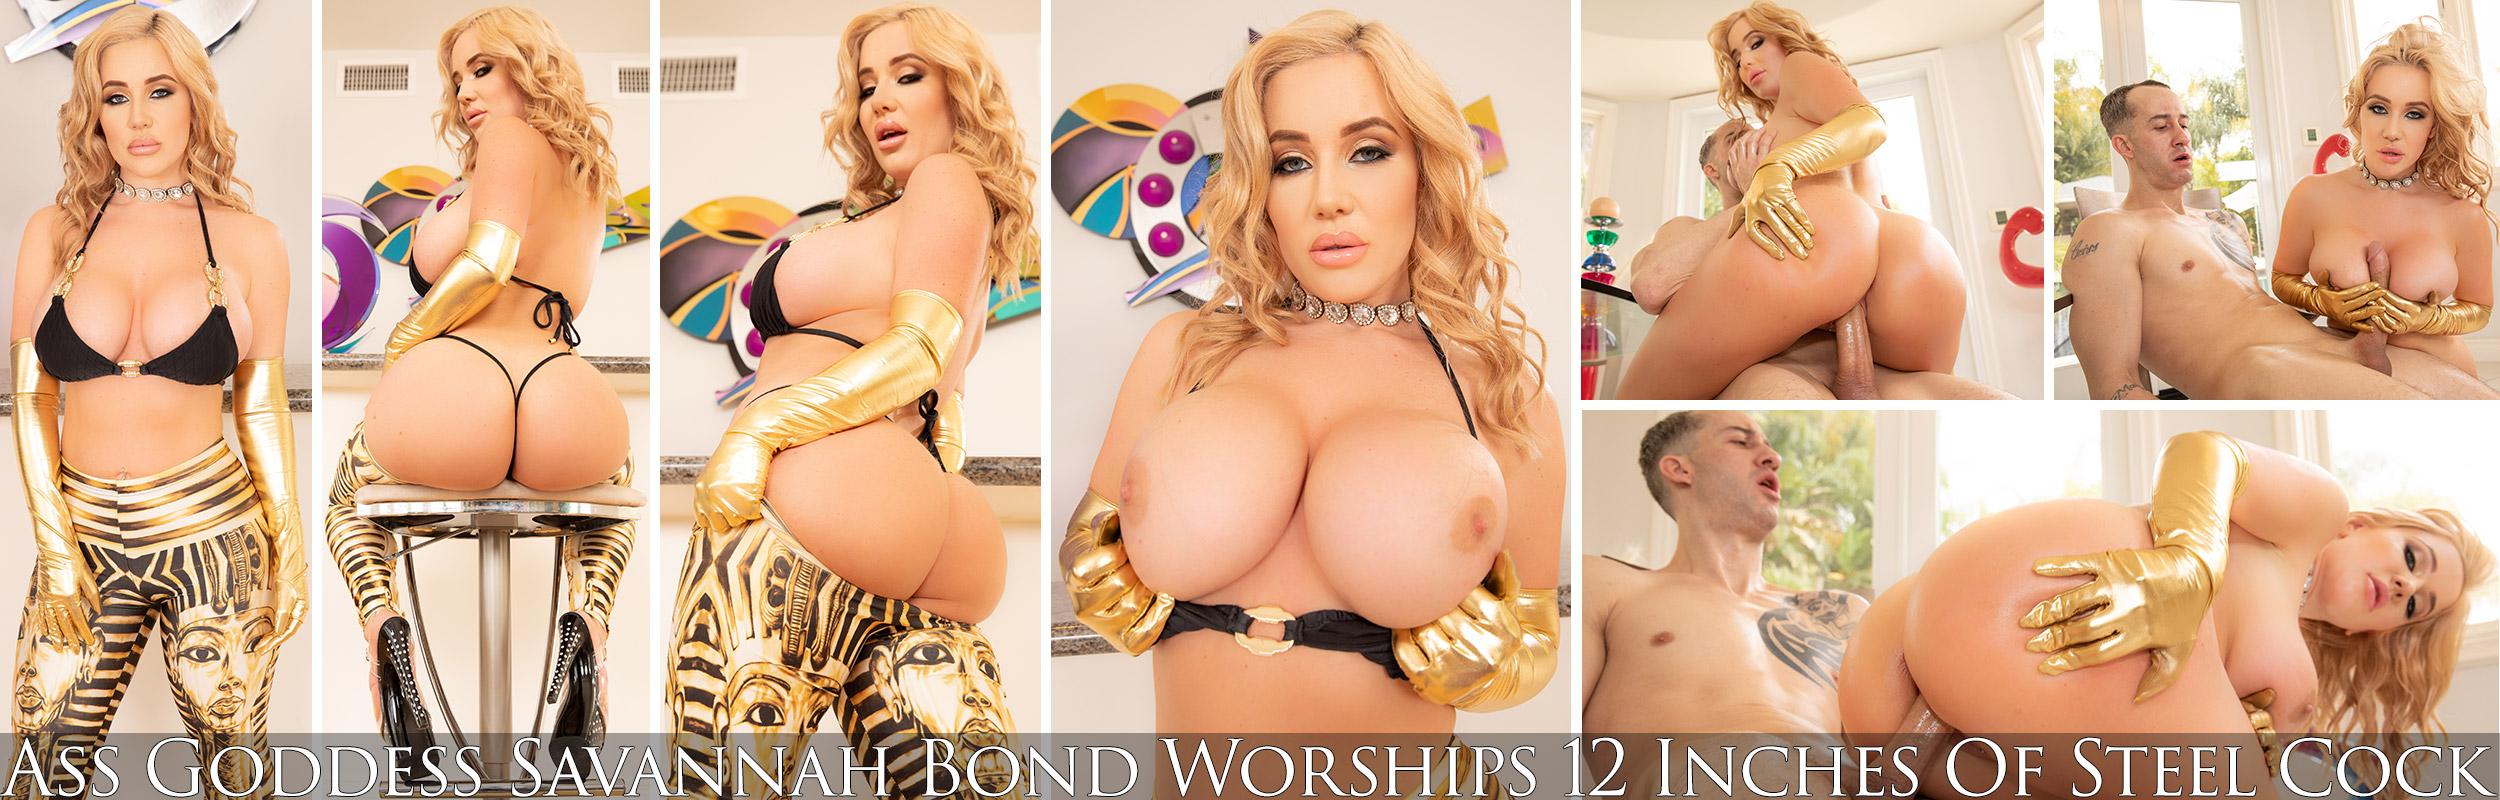 Ass Goddess Savannah Bond Worships 12 Inches Of Steel Cock